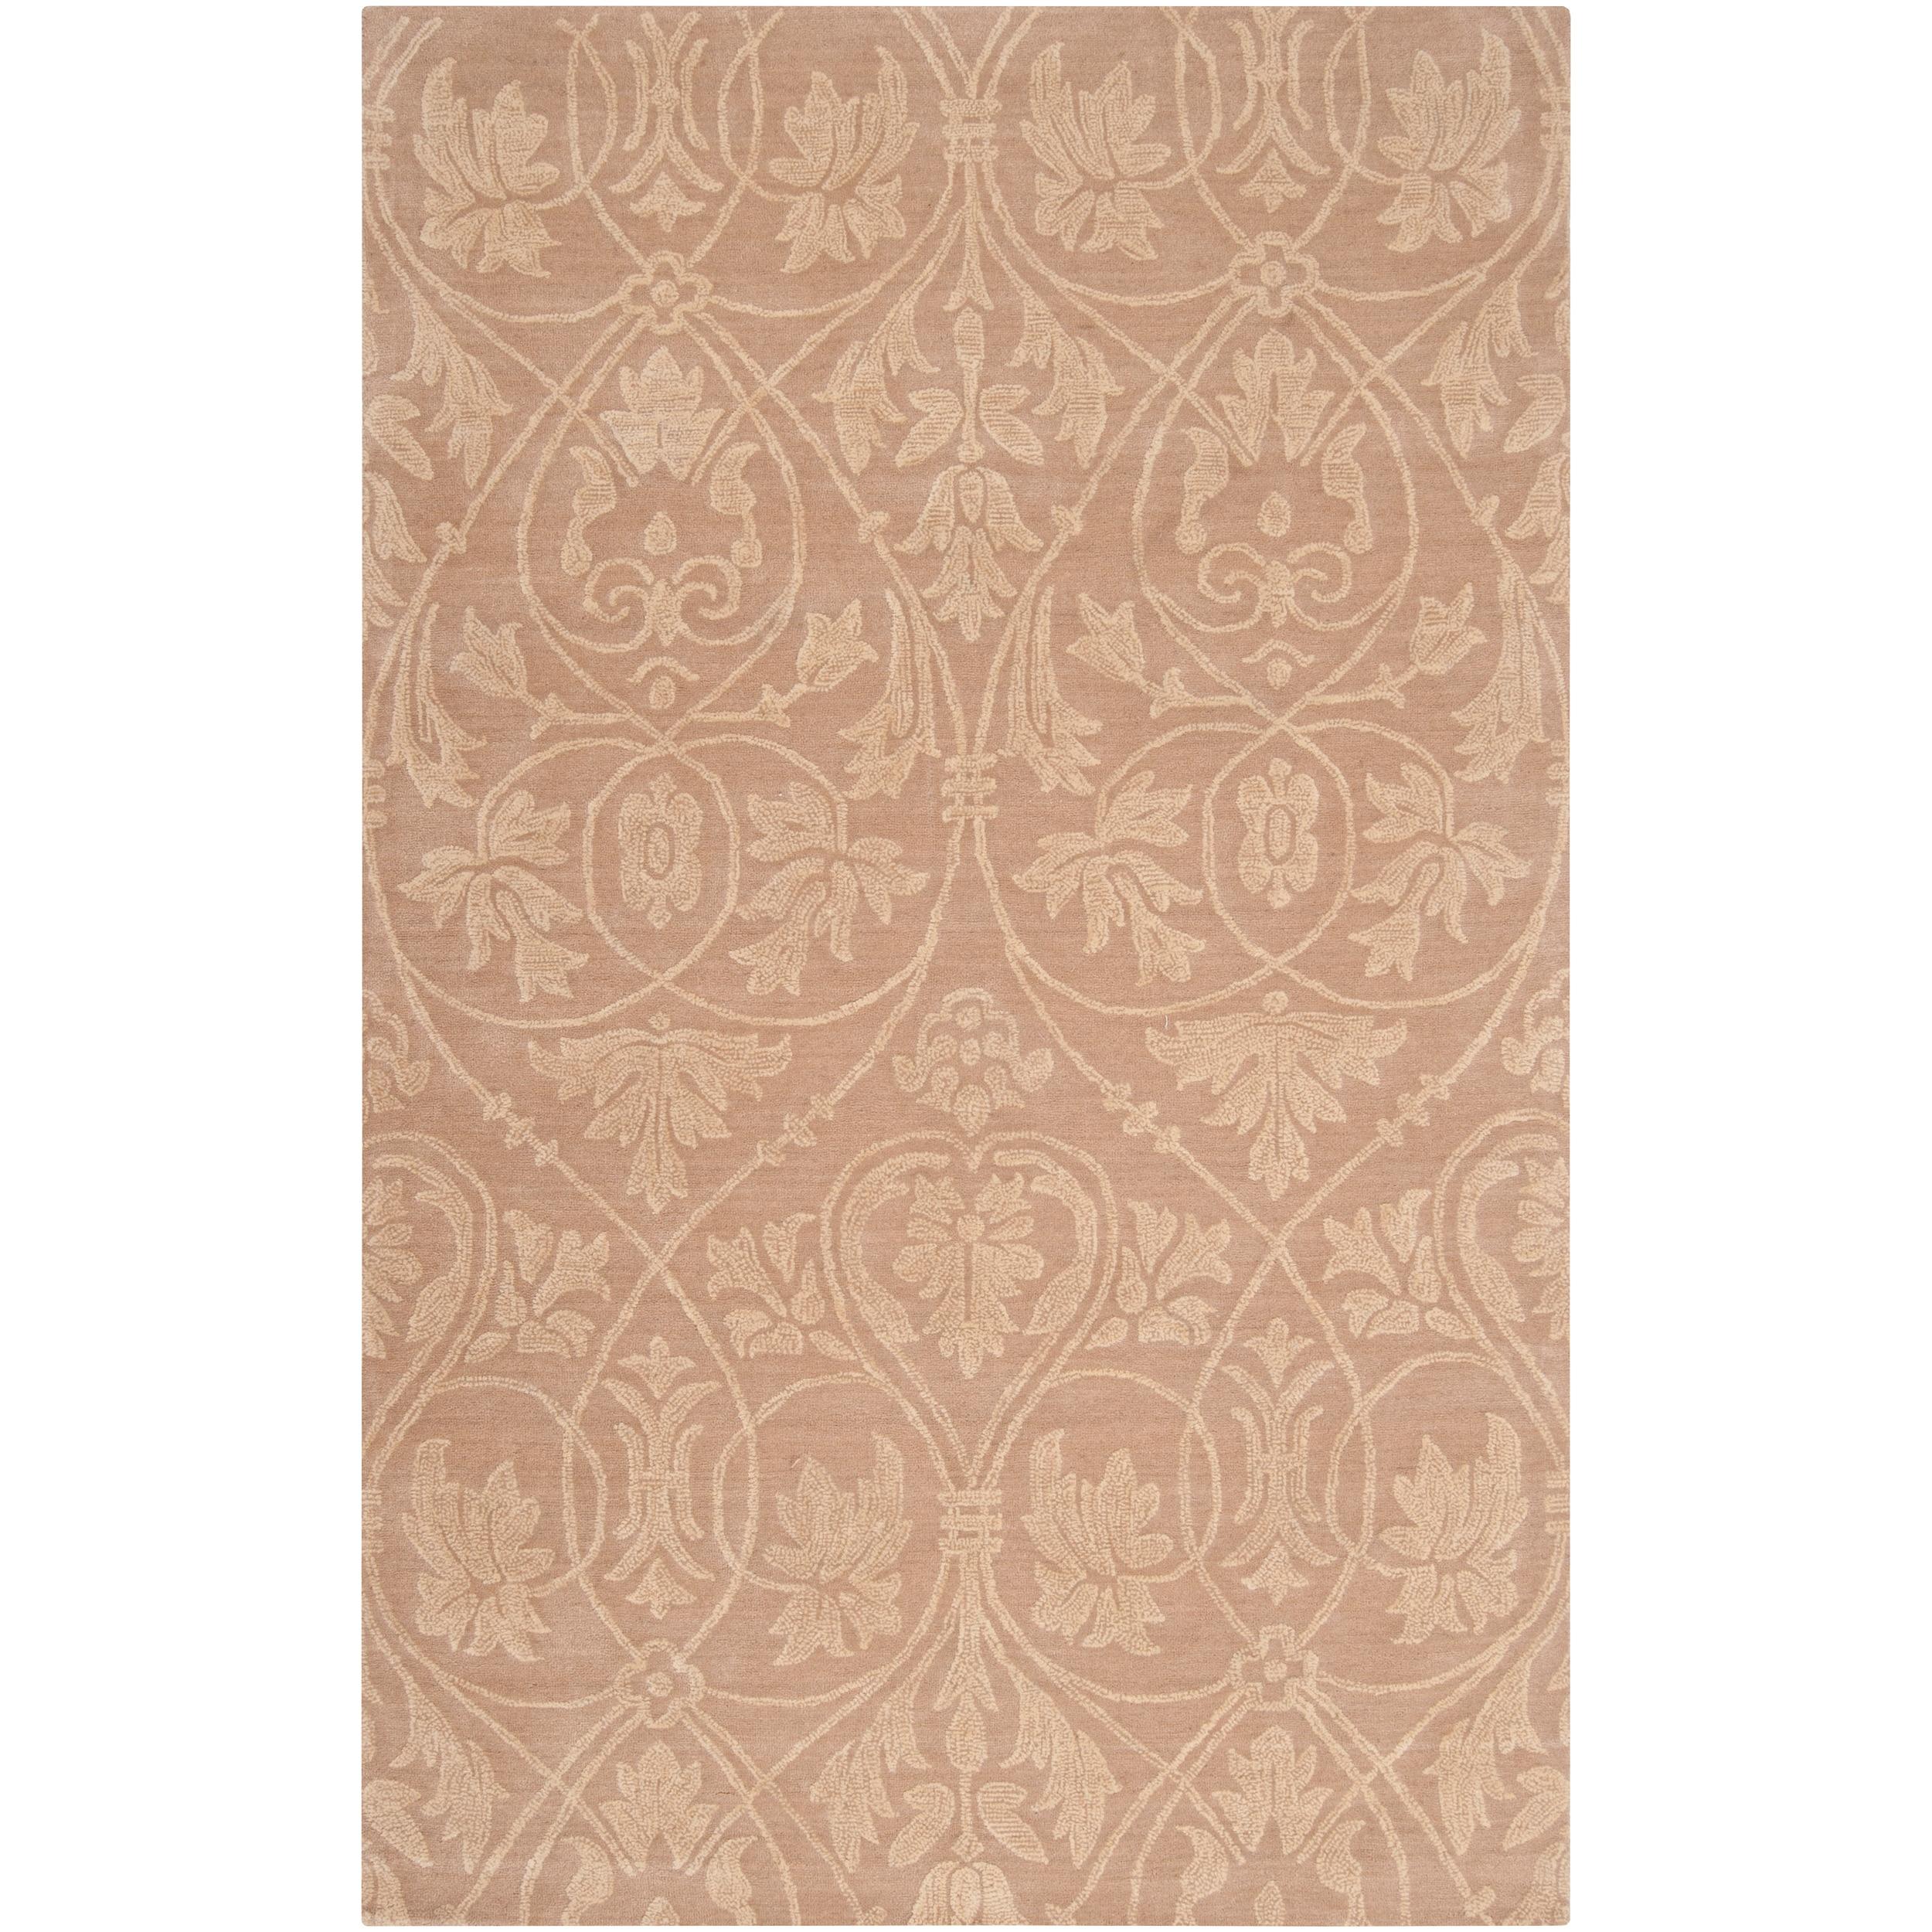 Woven Tan Carron Bay Wool and Nylon Rug (5' x 7'6)